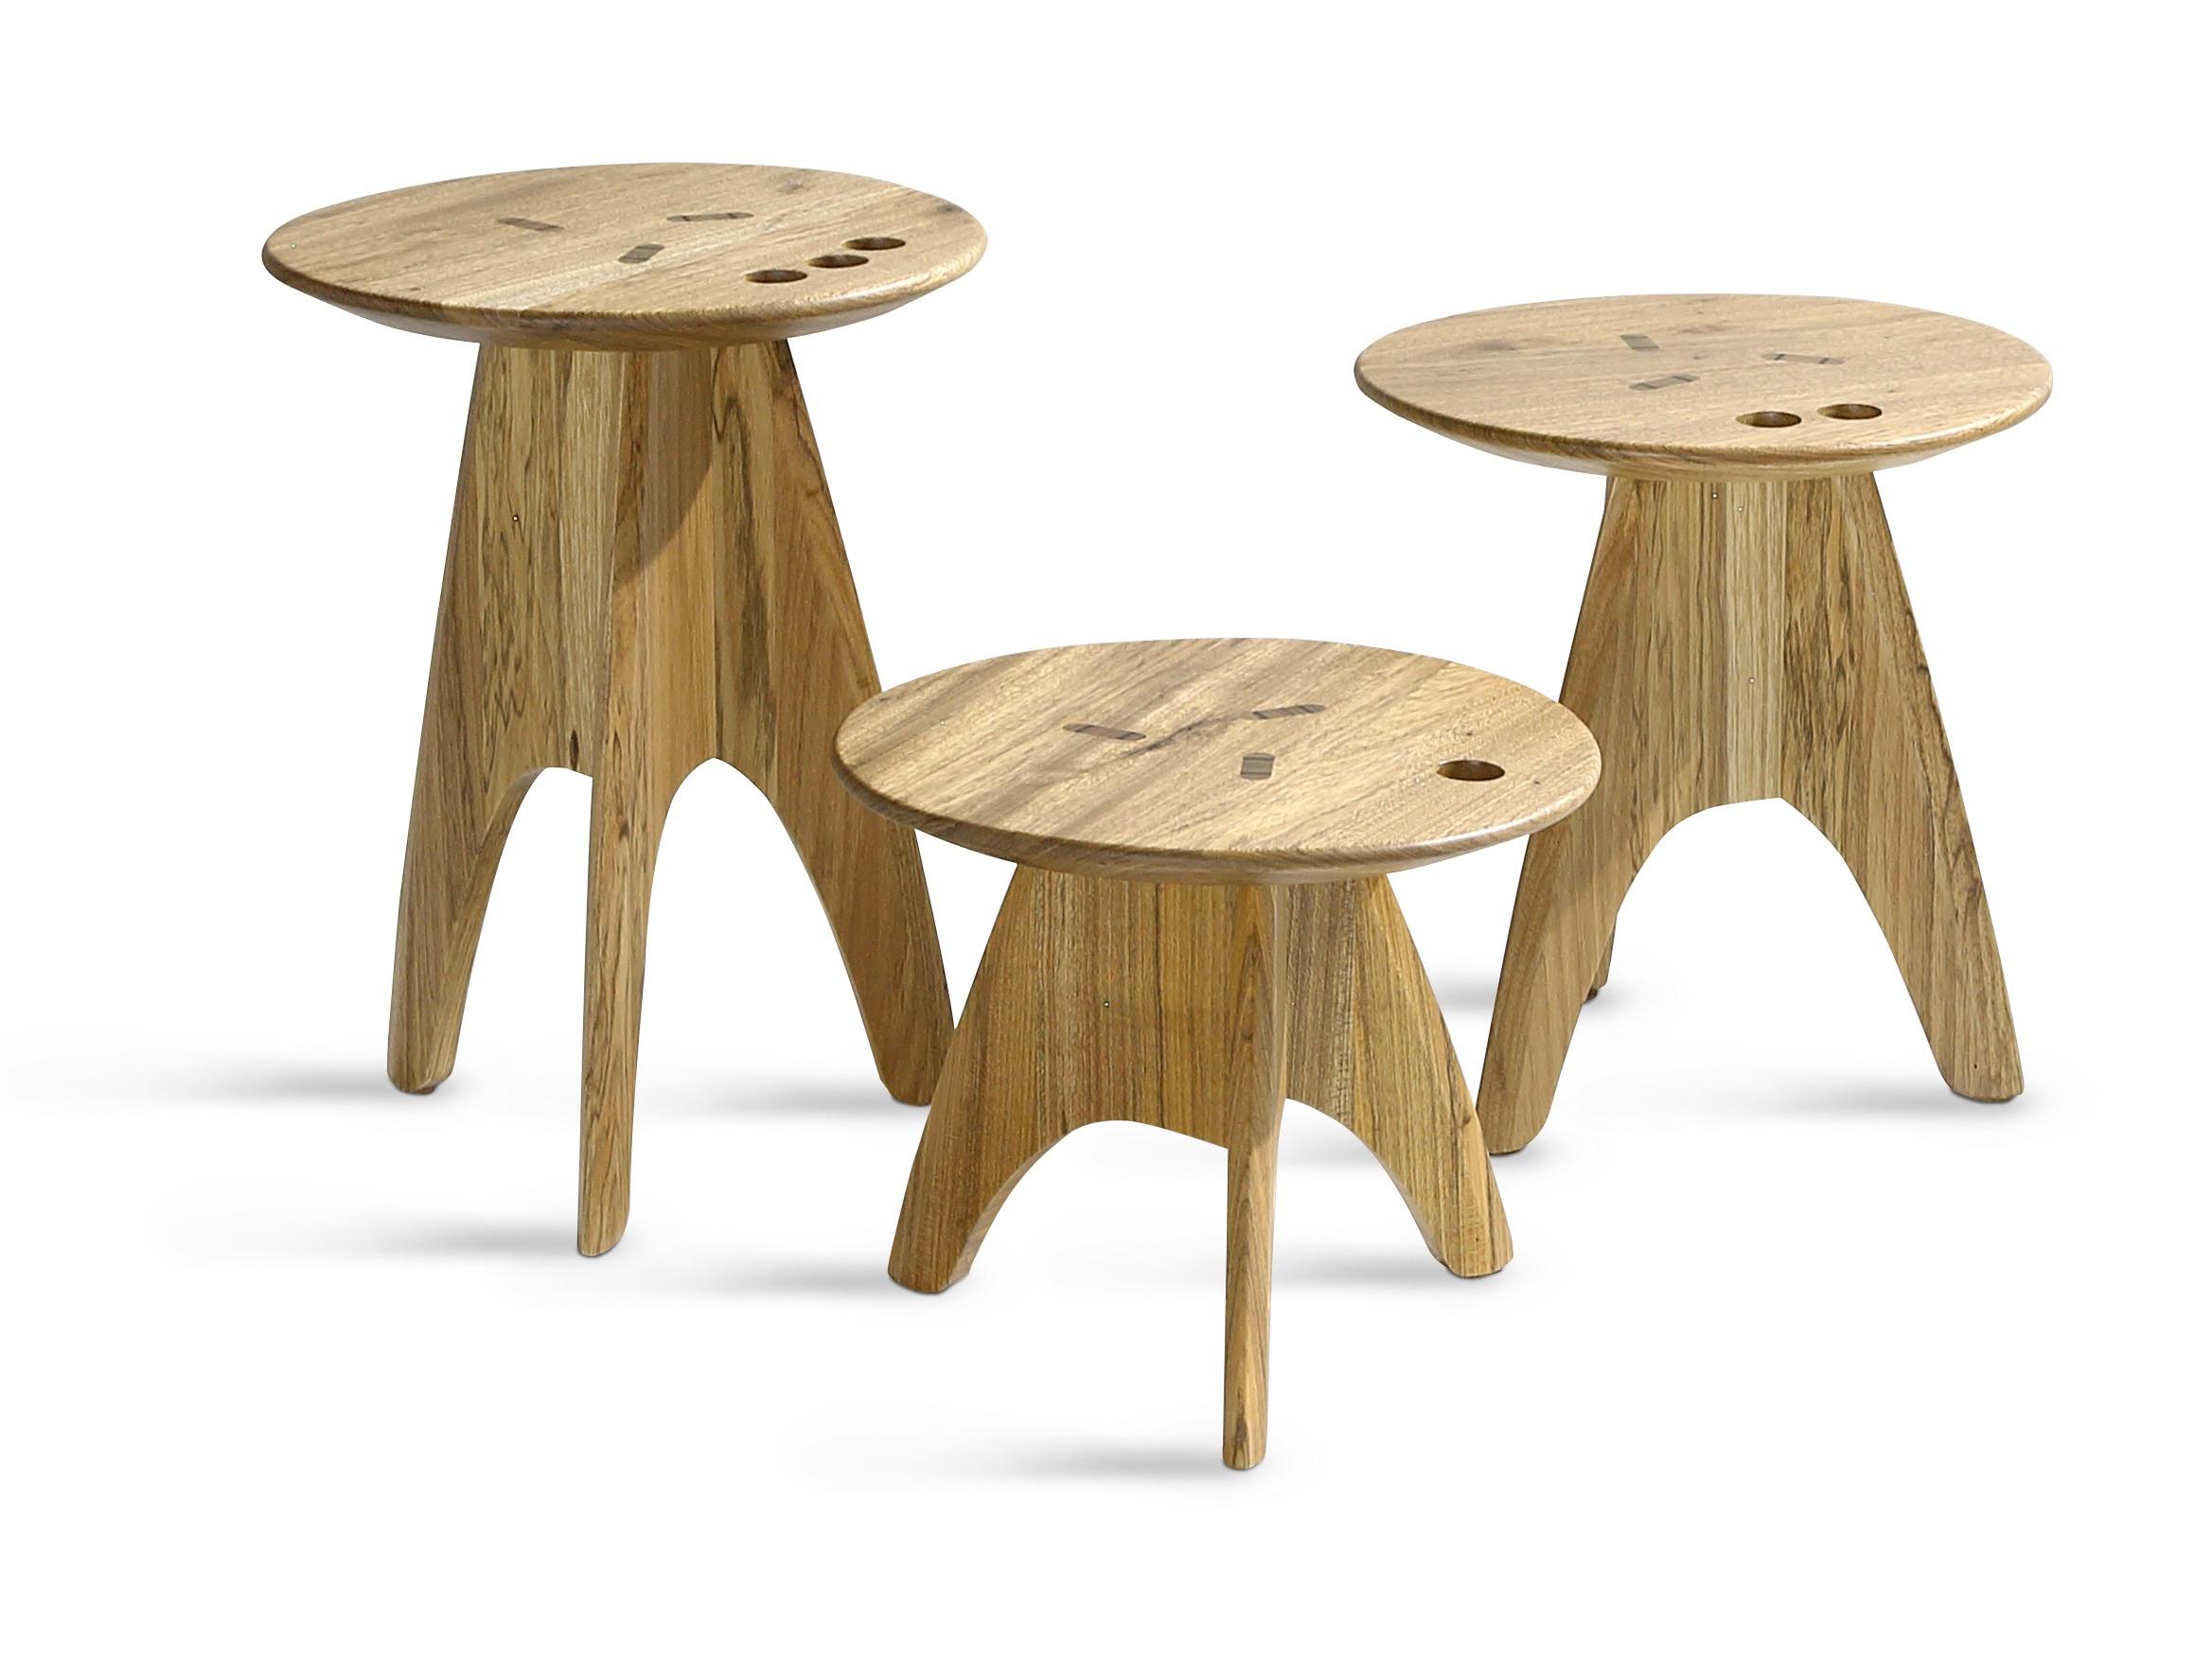 Retractable Coffee Table Rio Design At The Milan Design Week Fuorisaloneit